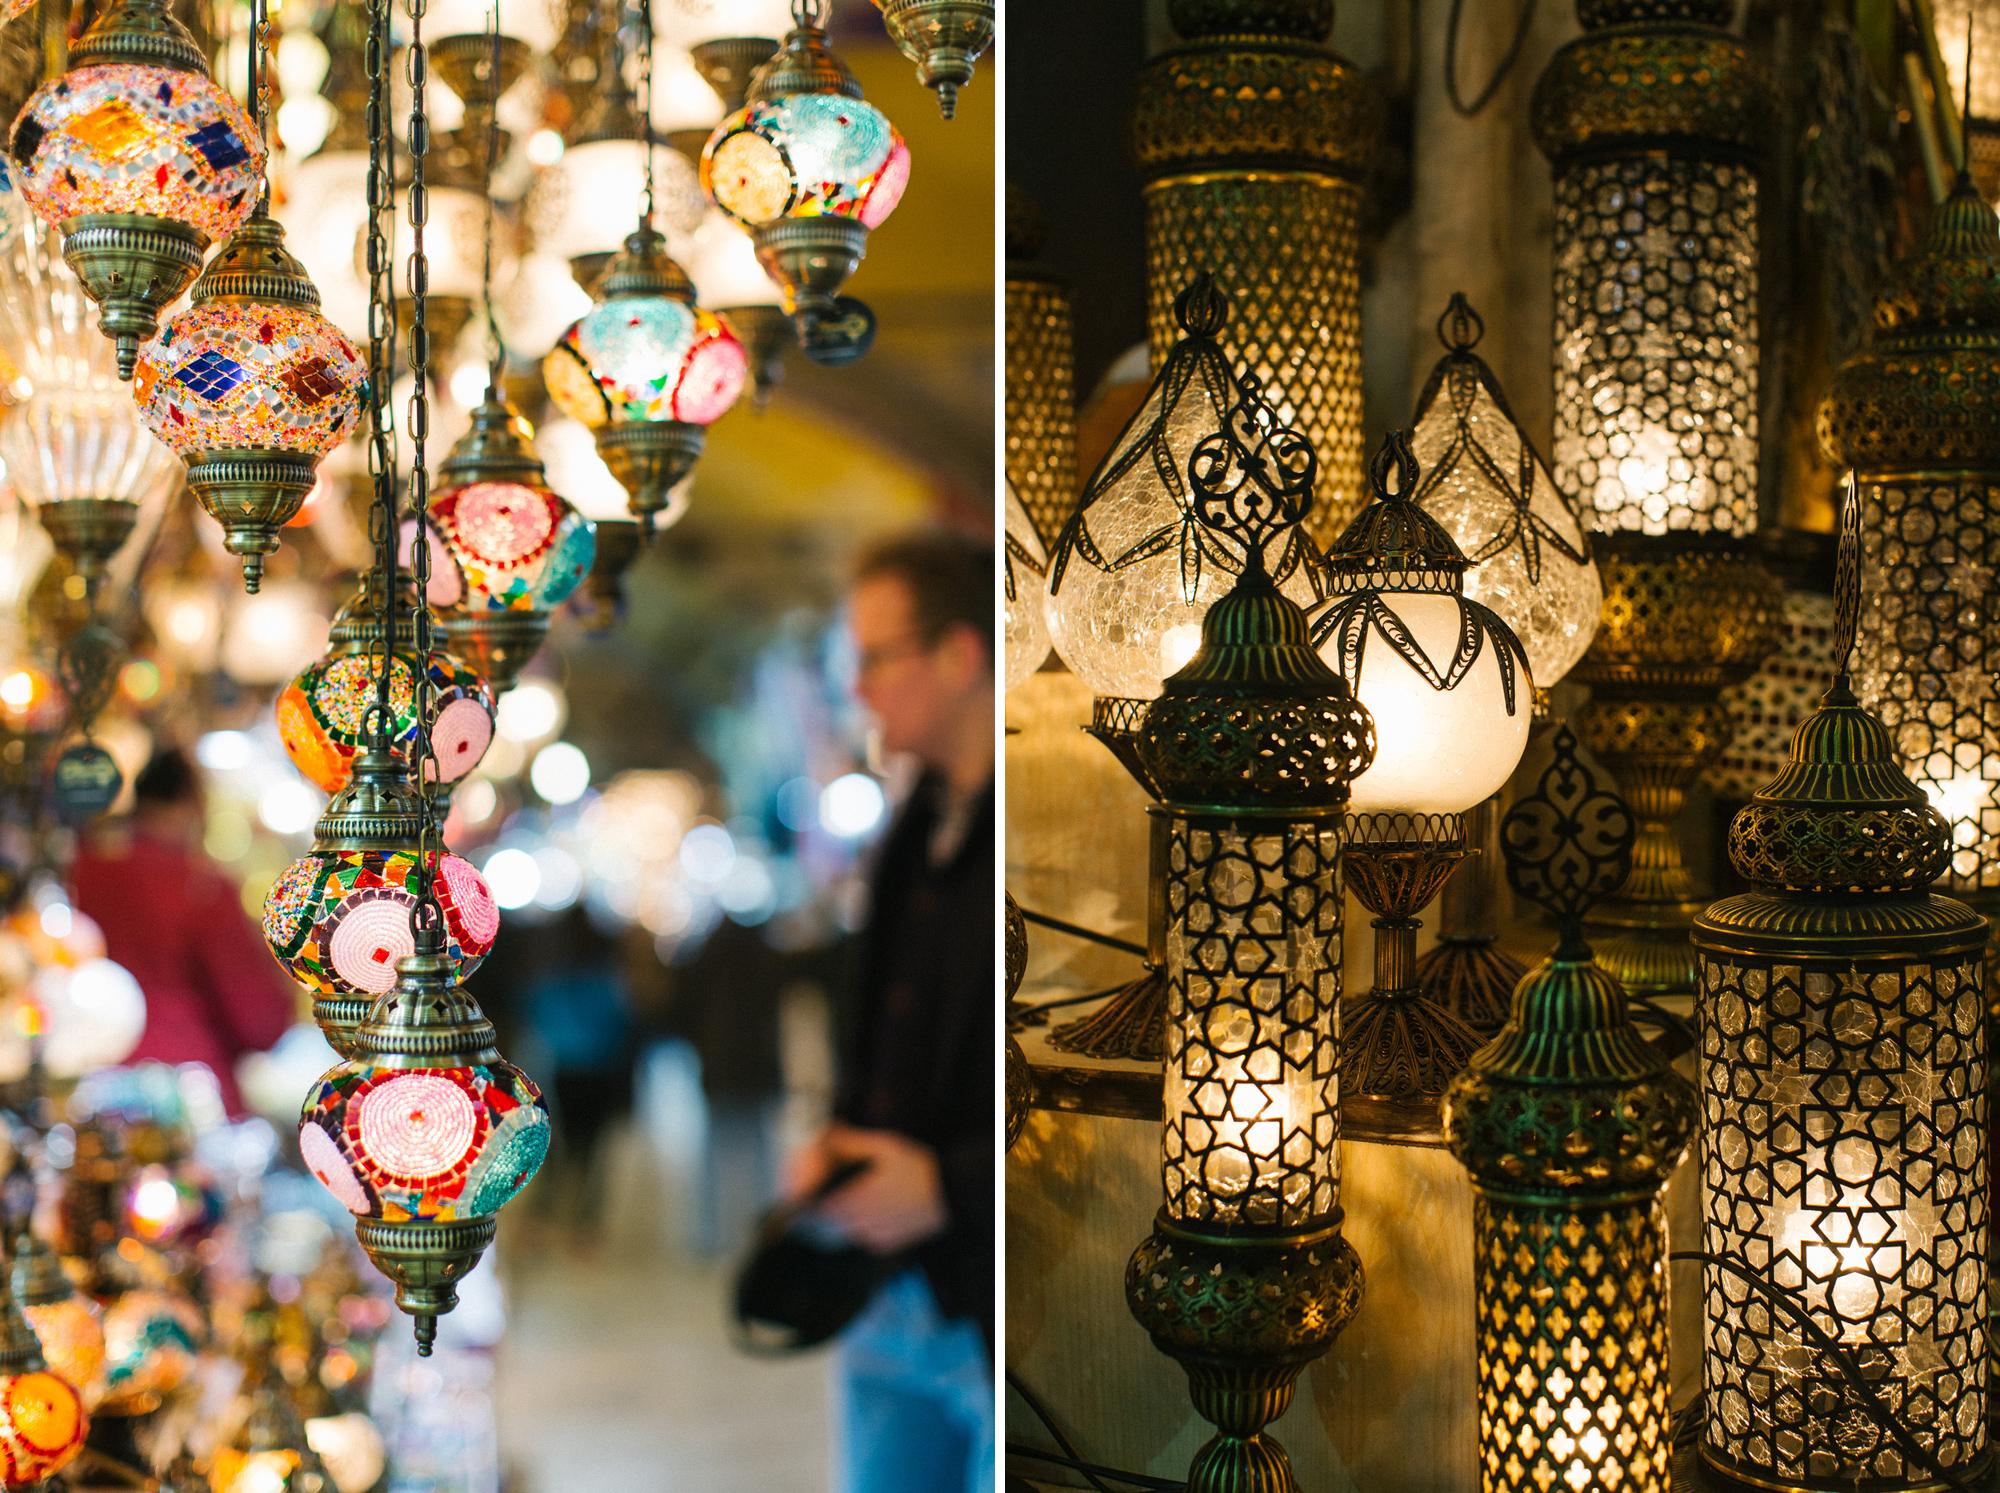 Istanbul_Grand_Bazaar-AudiMagazine-FinnBeales-02.jpg